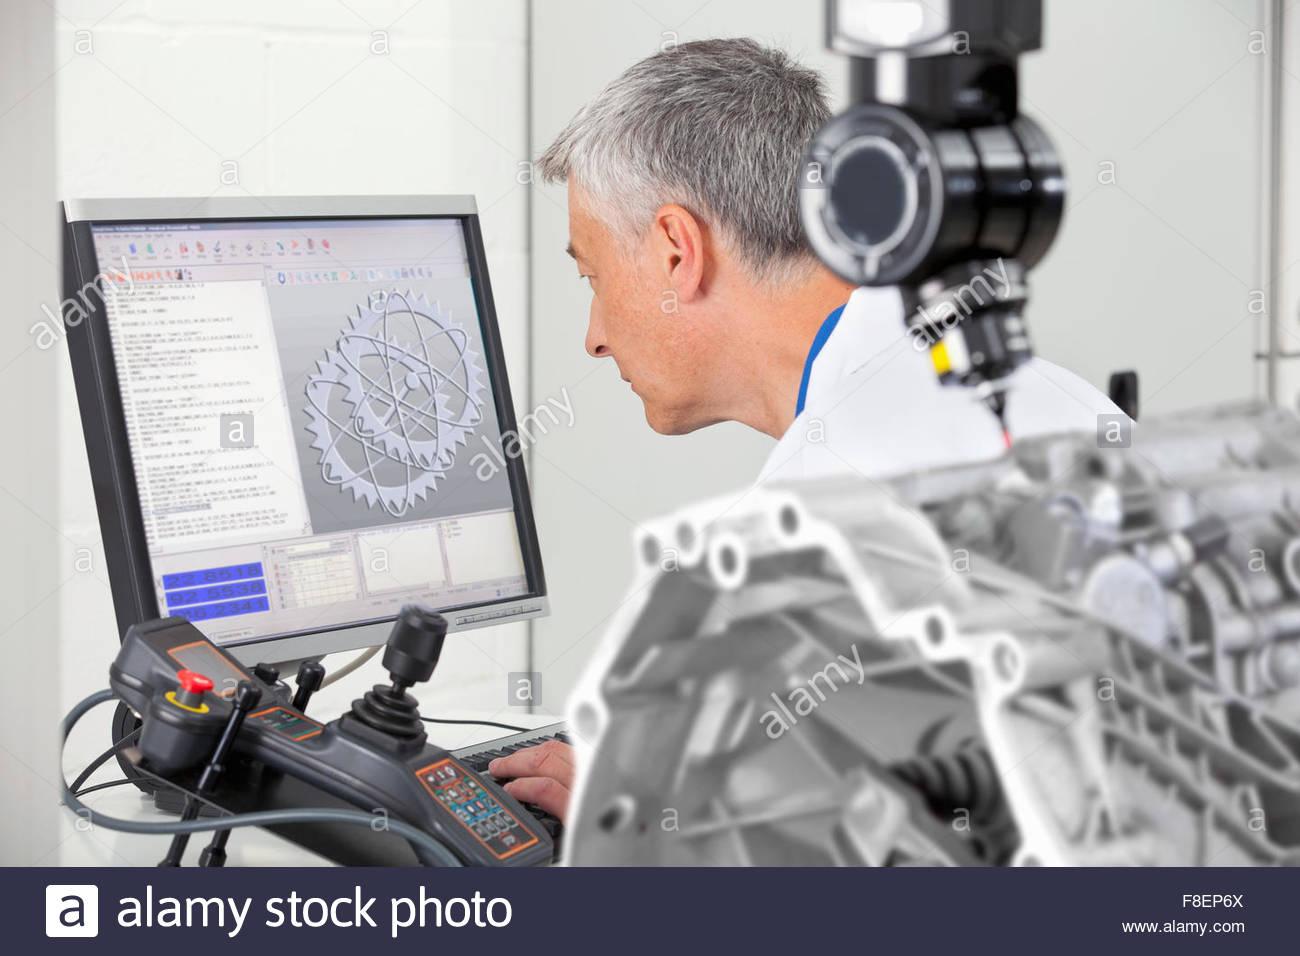 Engineer working at computer behind probe scanning engine block - Stock Image